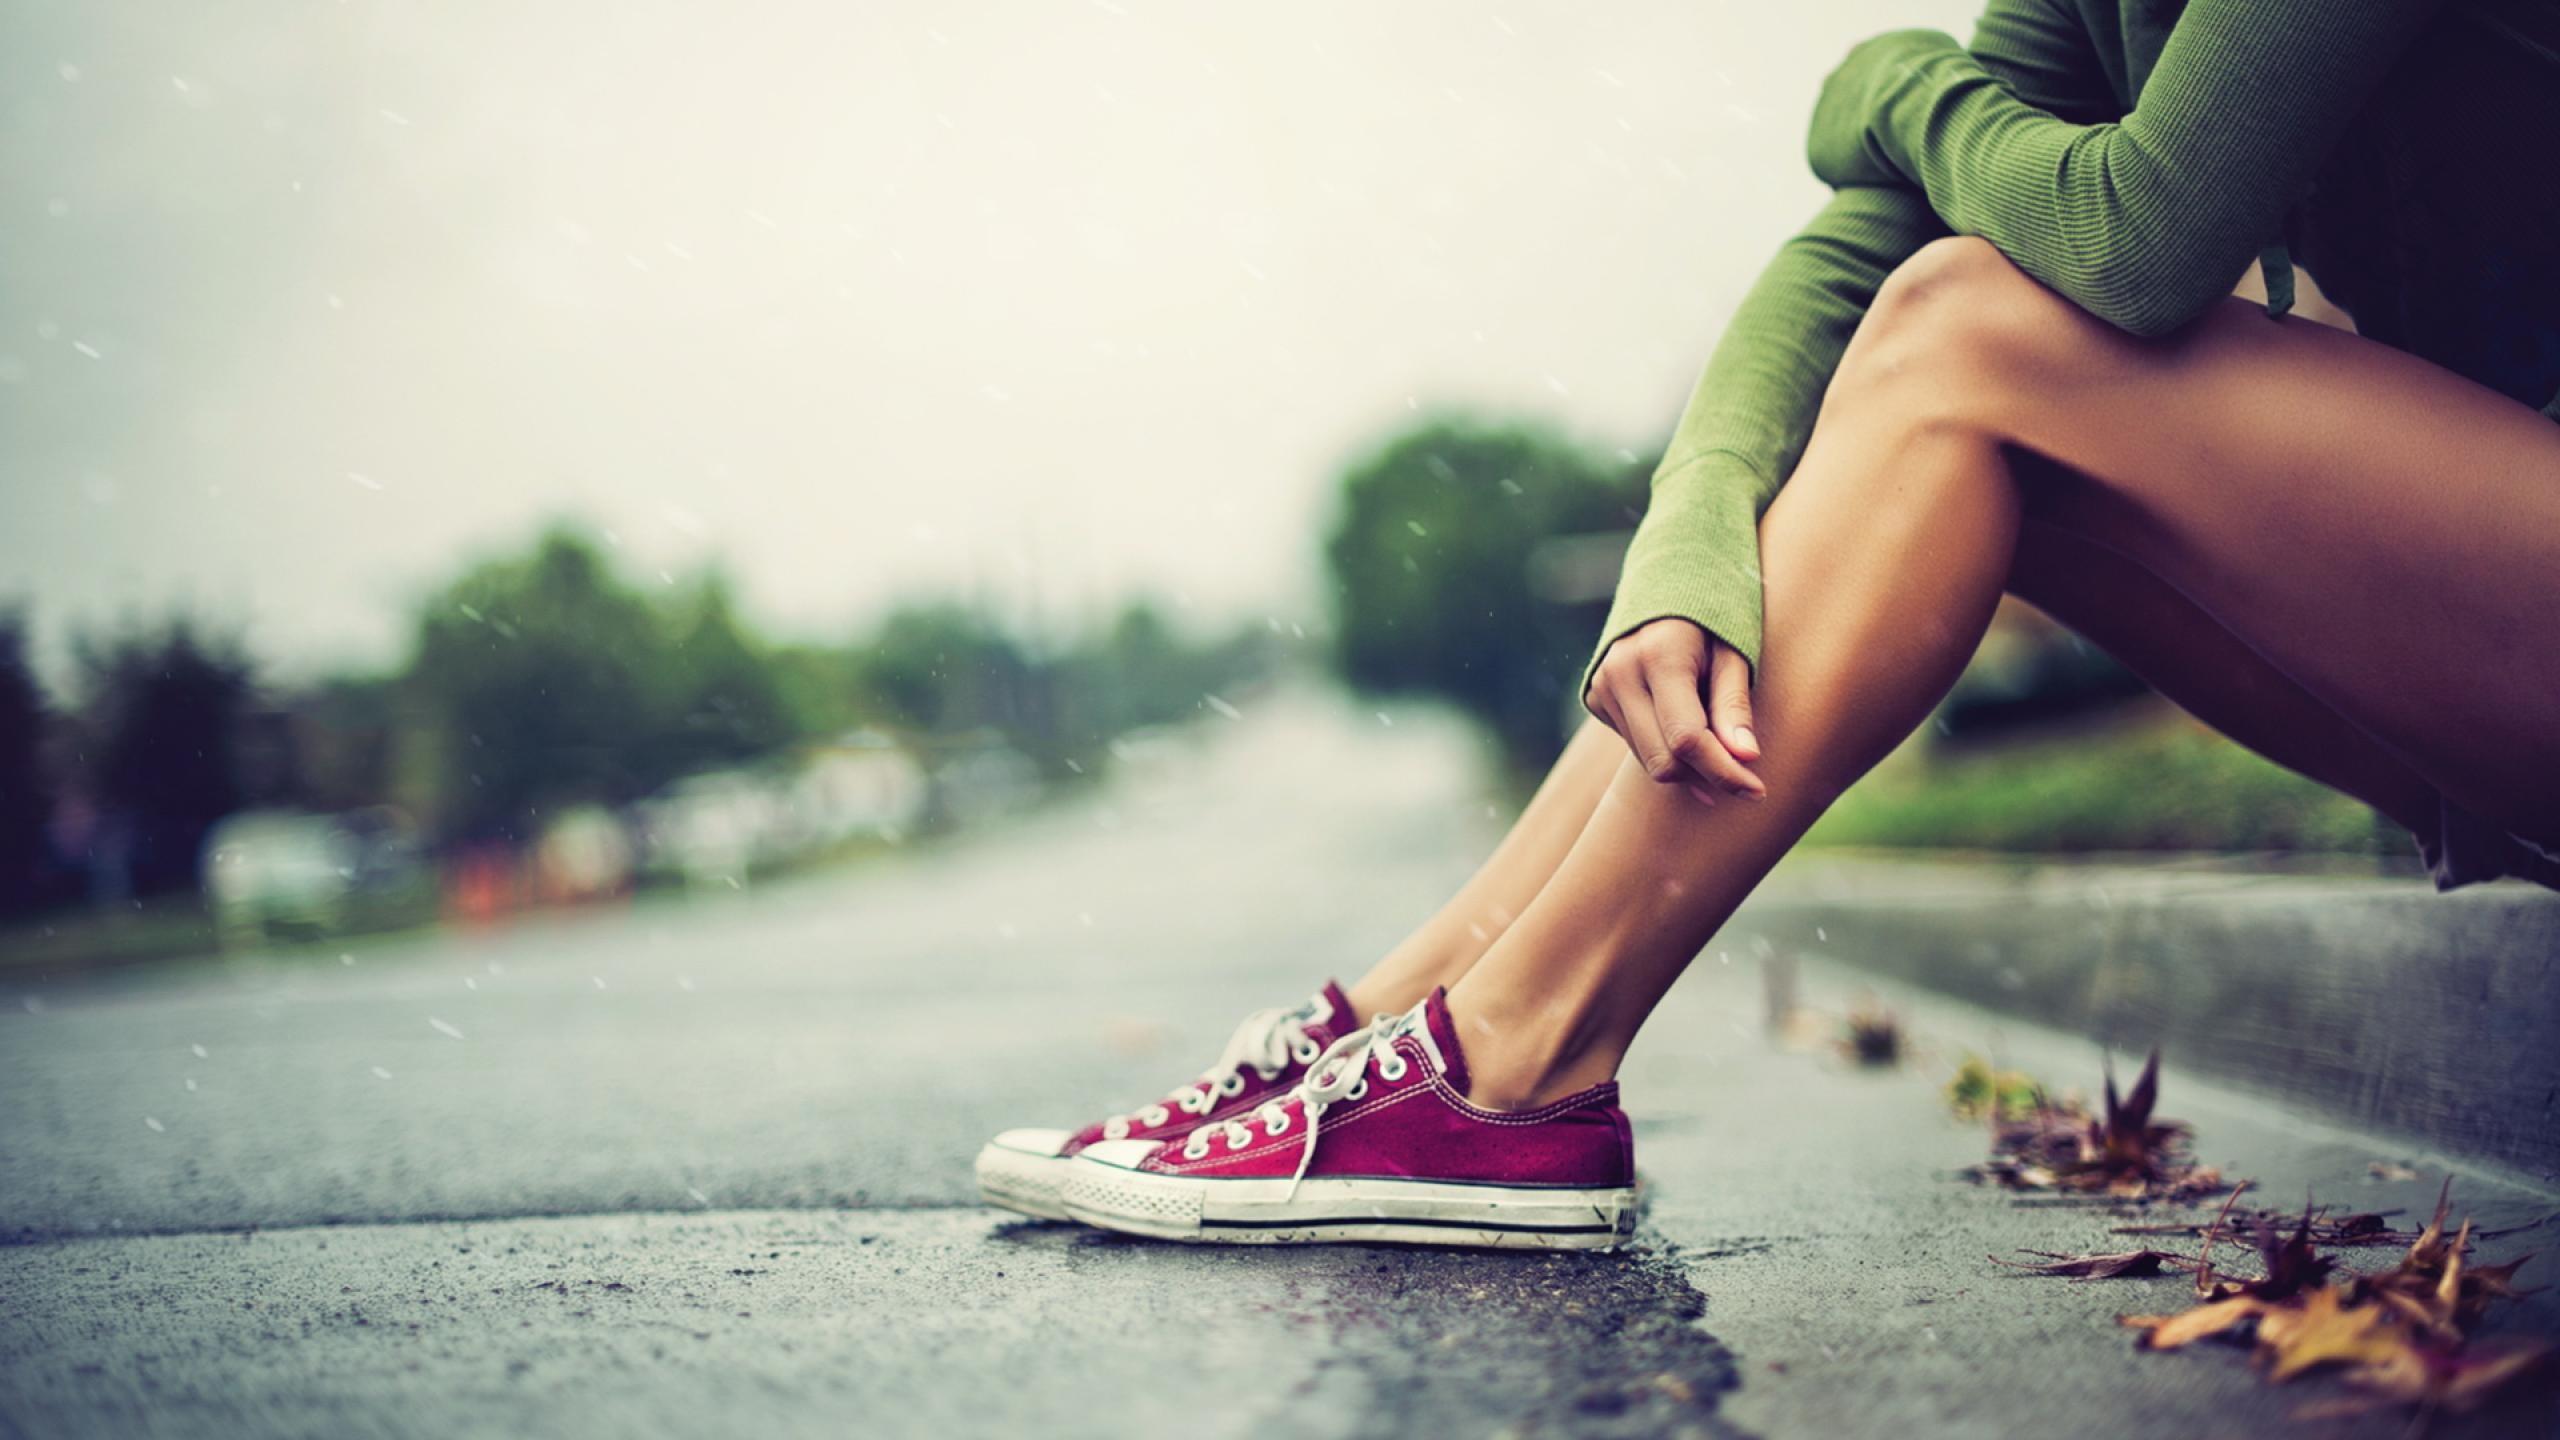 People 2560x1440 photography street rain leaves legs Converse women shoes